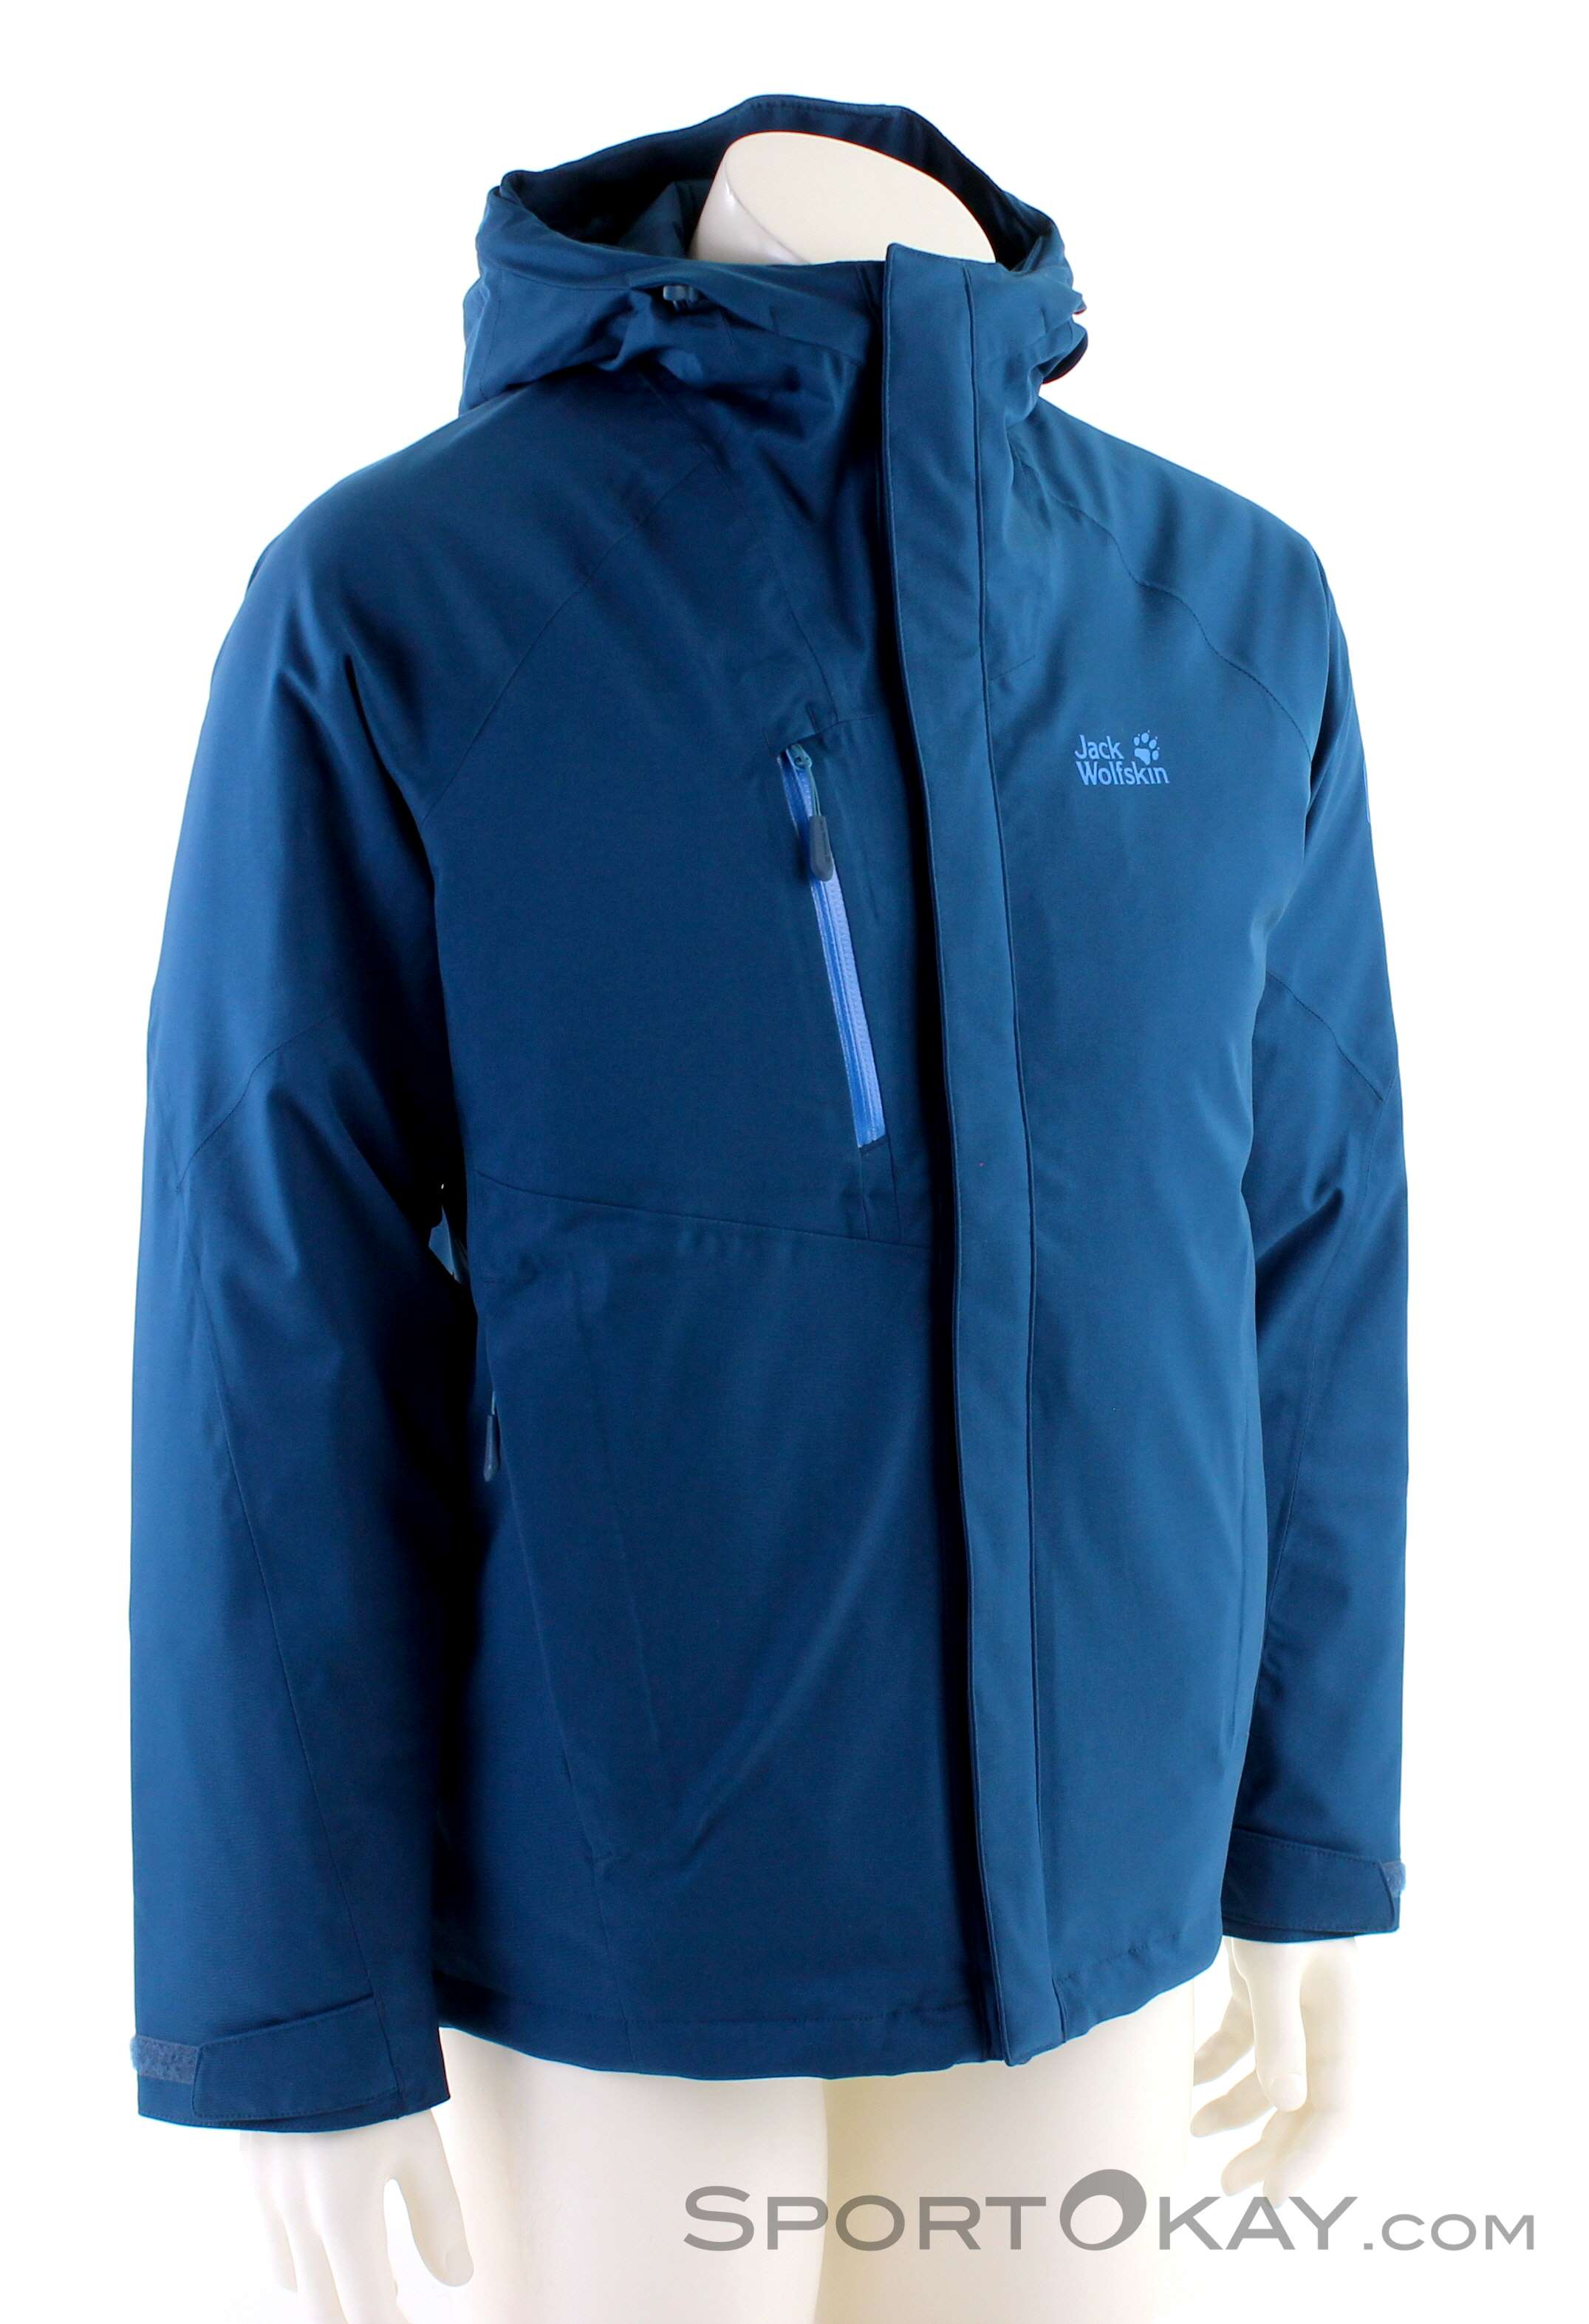 Jack Wolfskin Jack Wolfskin Troposphere Jacket Mens Outdoor Jacket